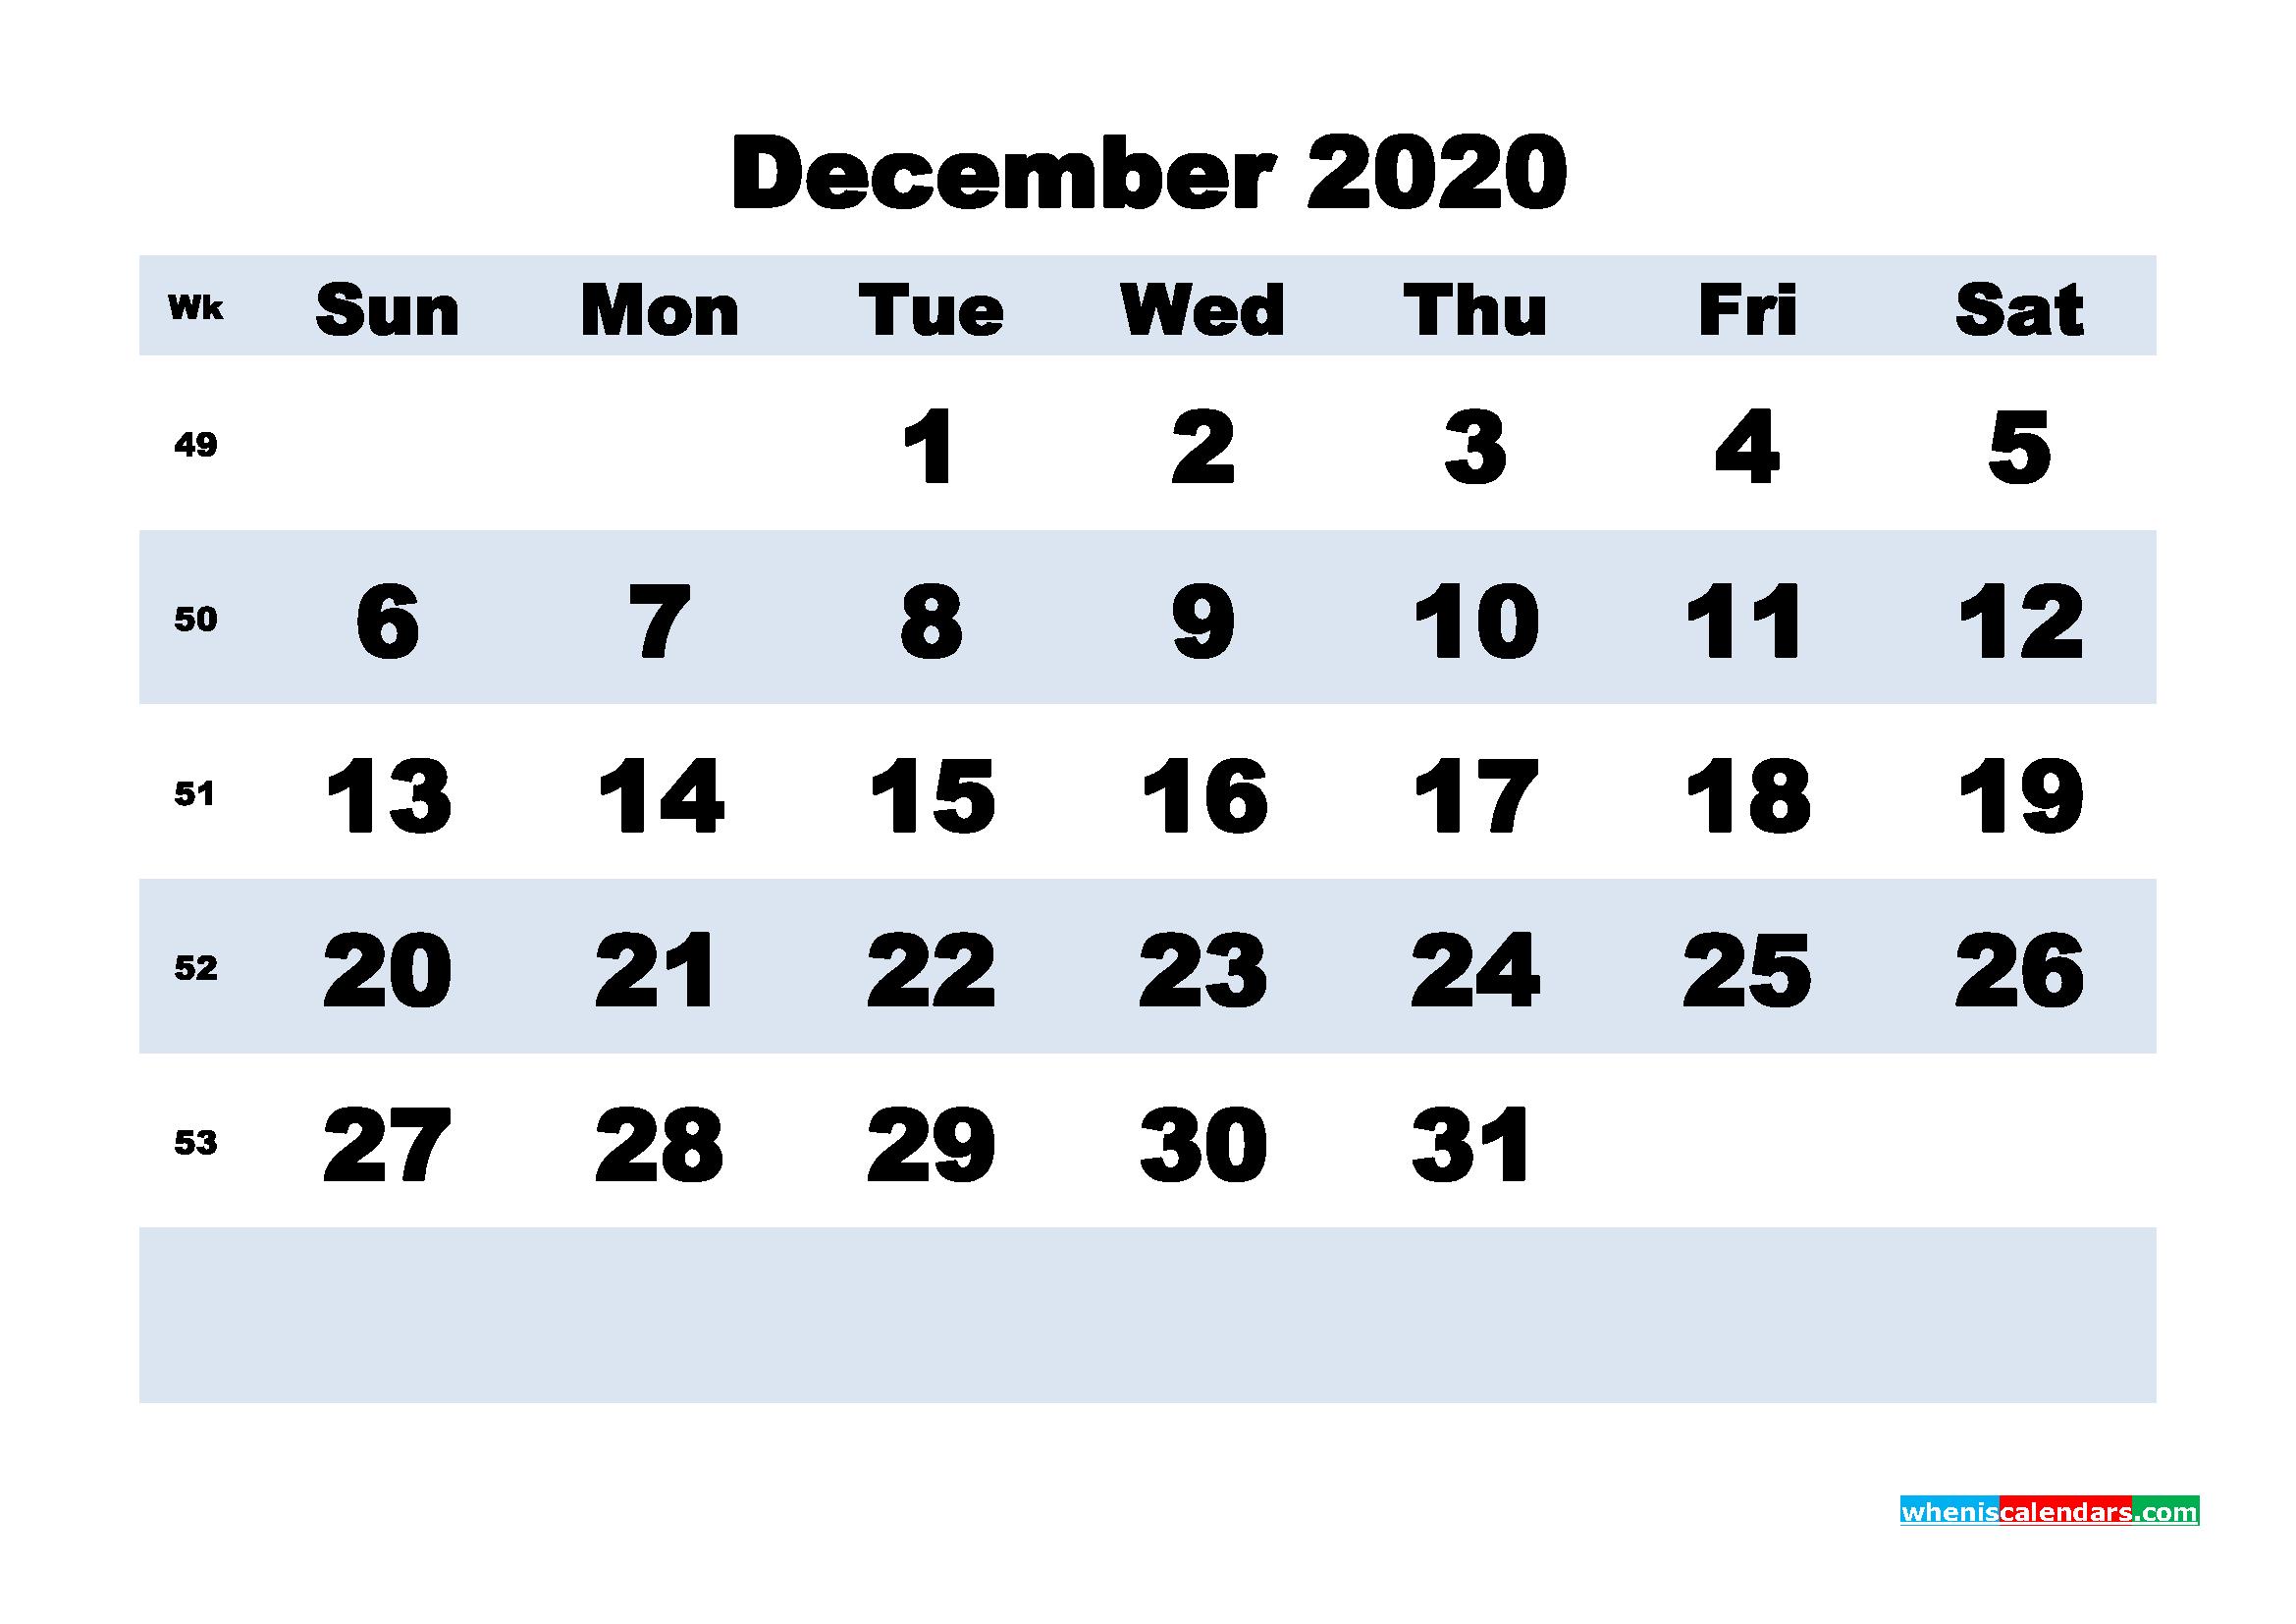 December Printable Calendar 2020 PDF, Word - No.m20b168